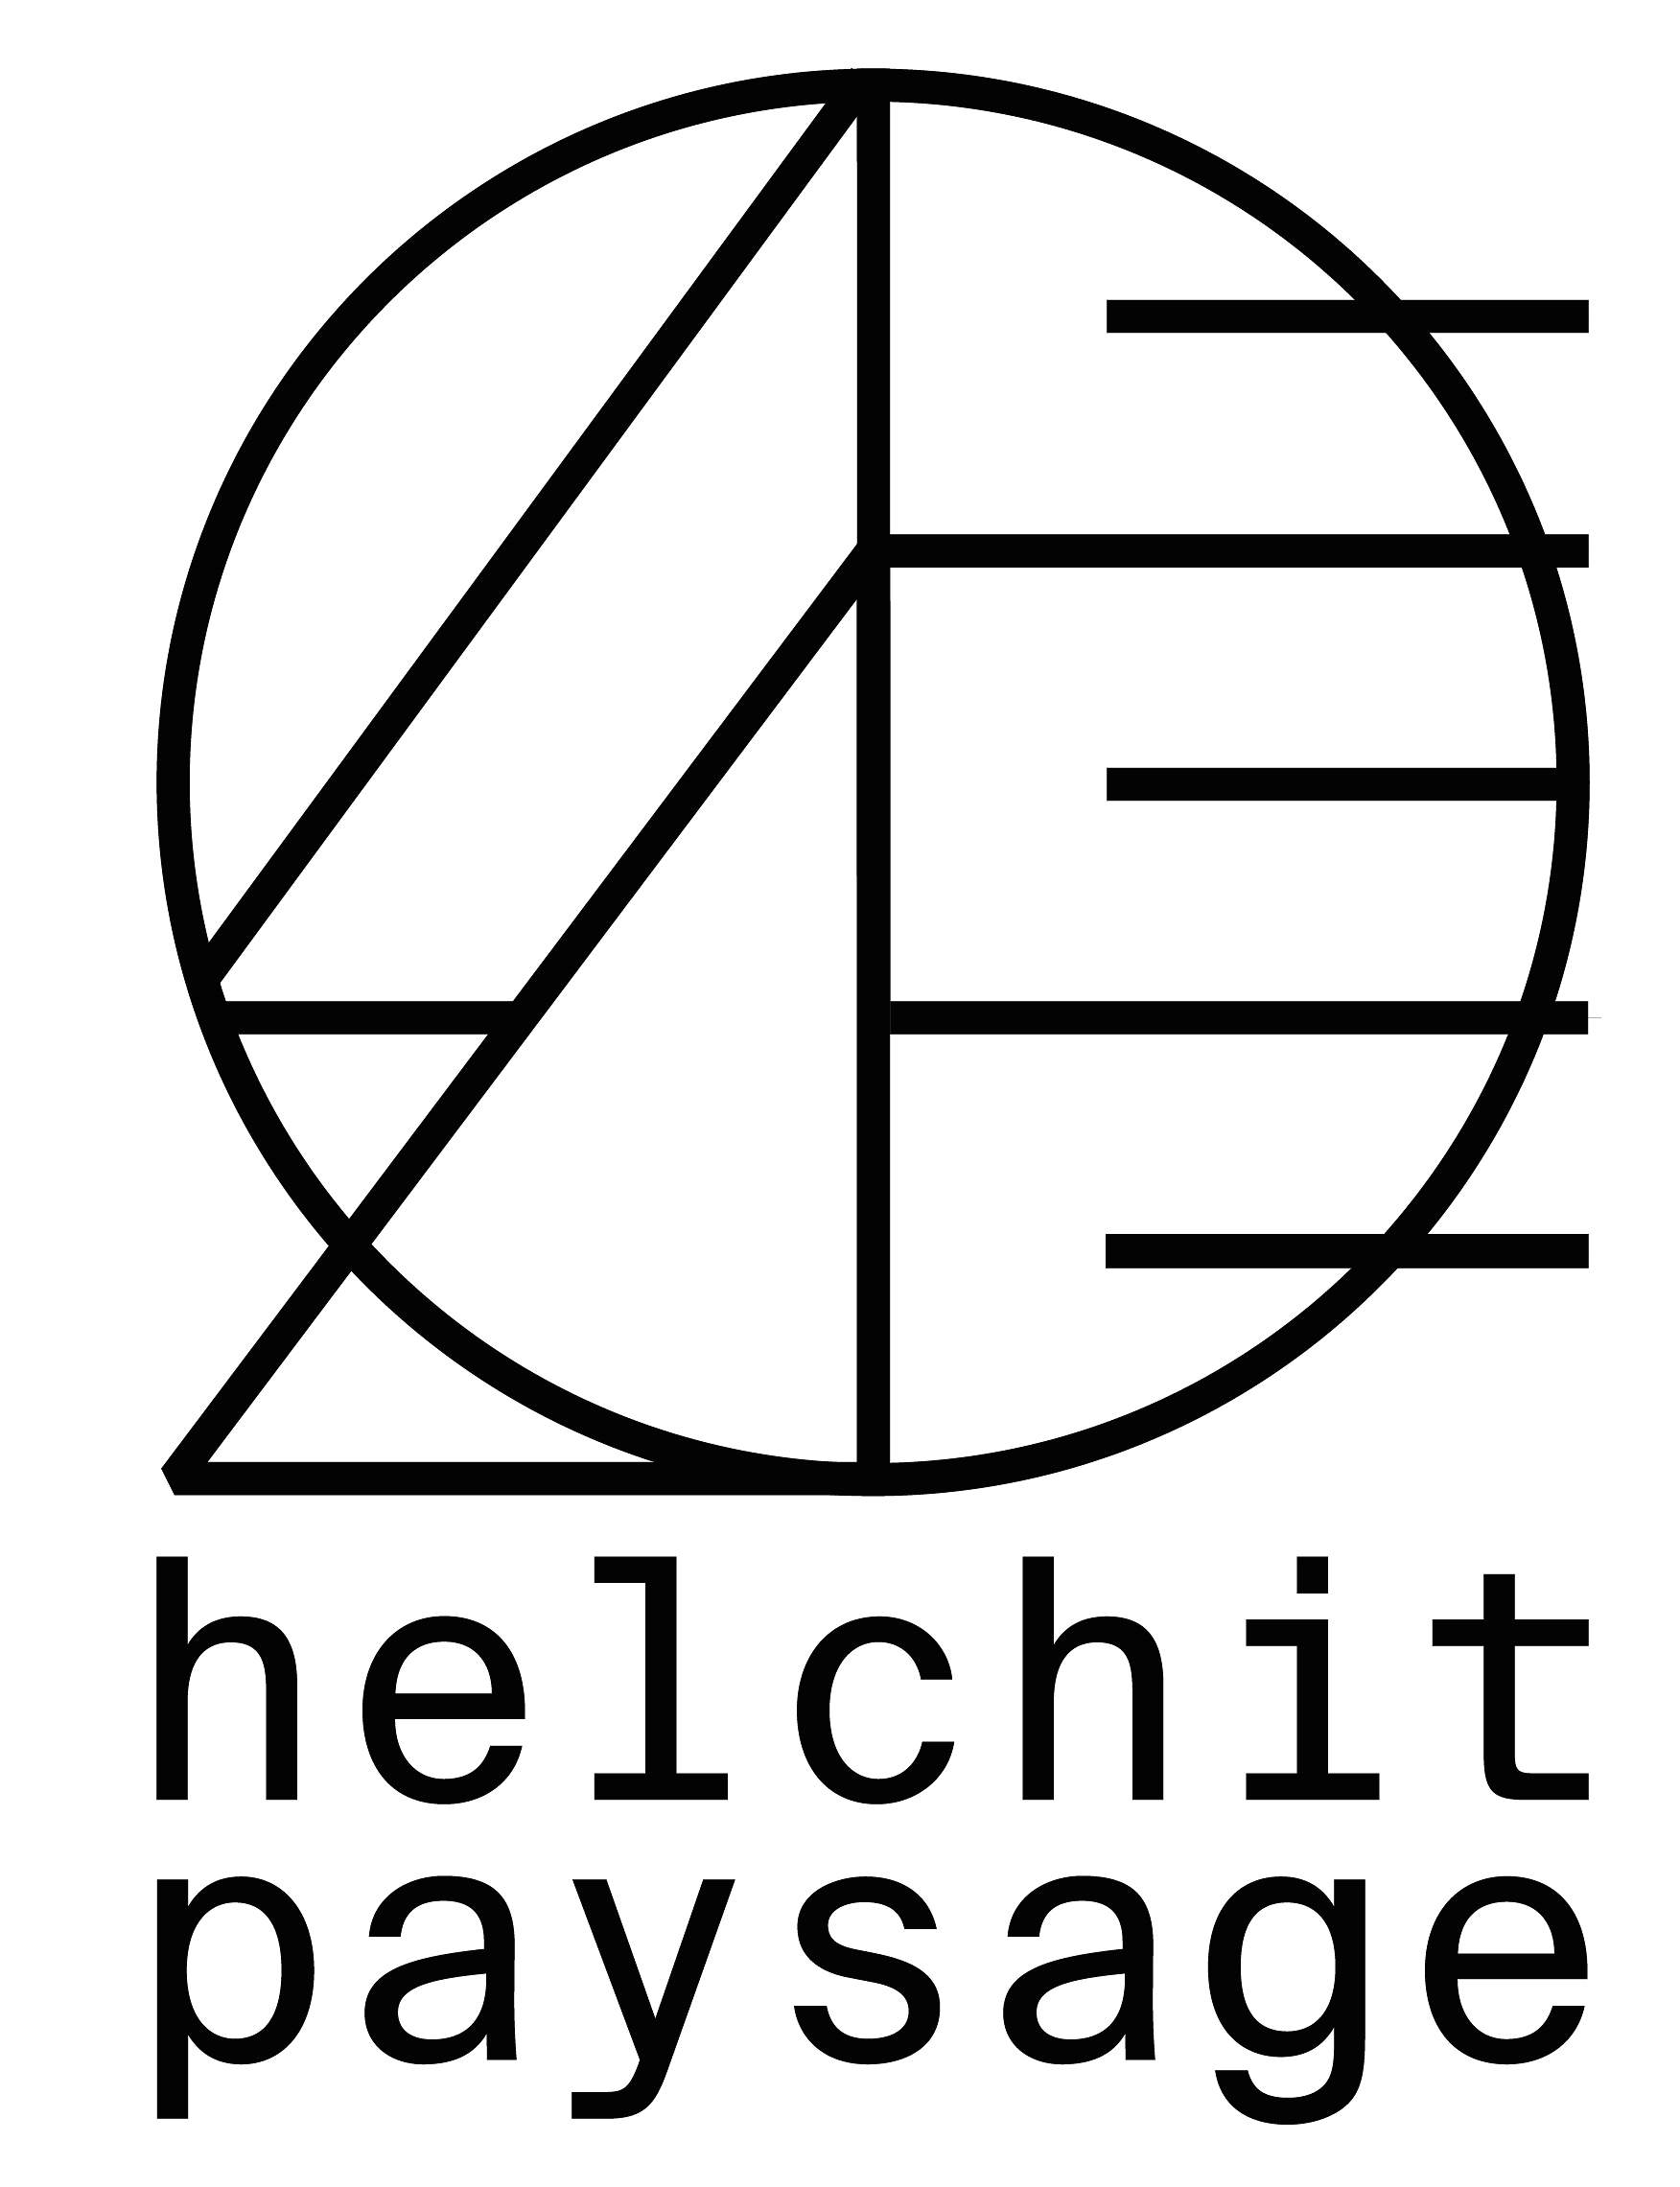 Helchit A. Sàrl